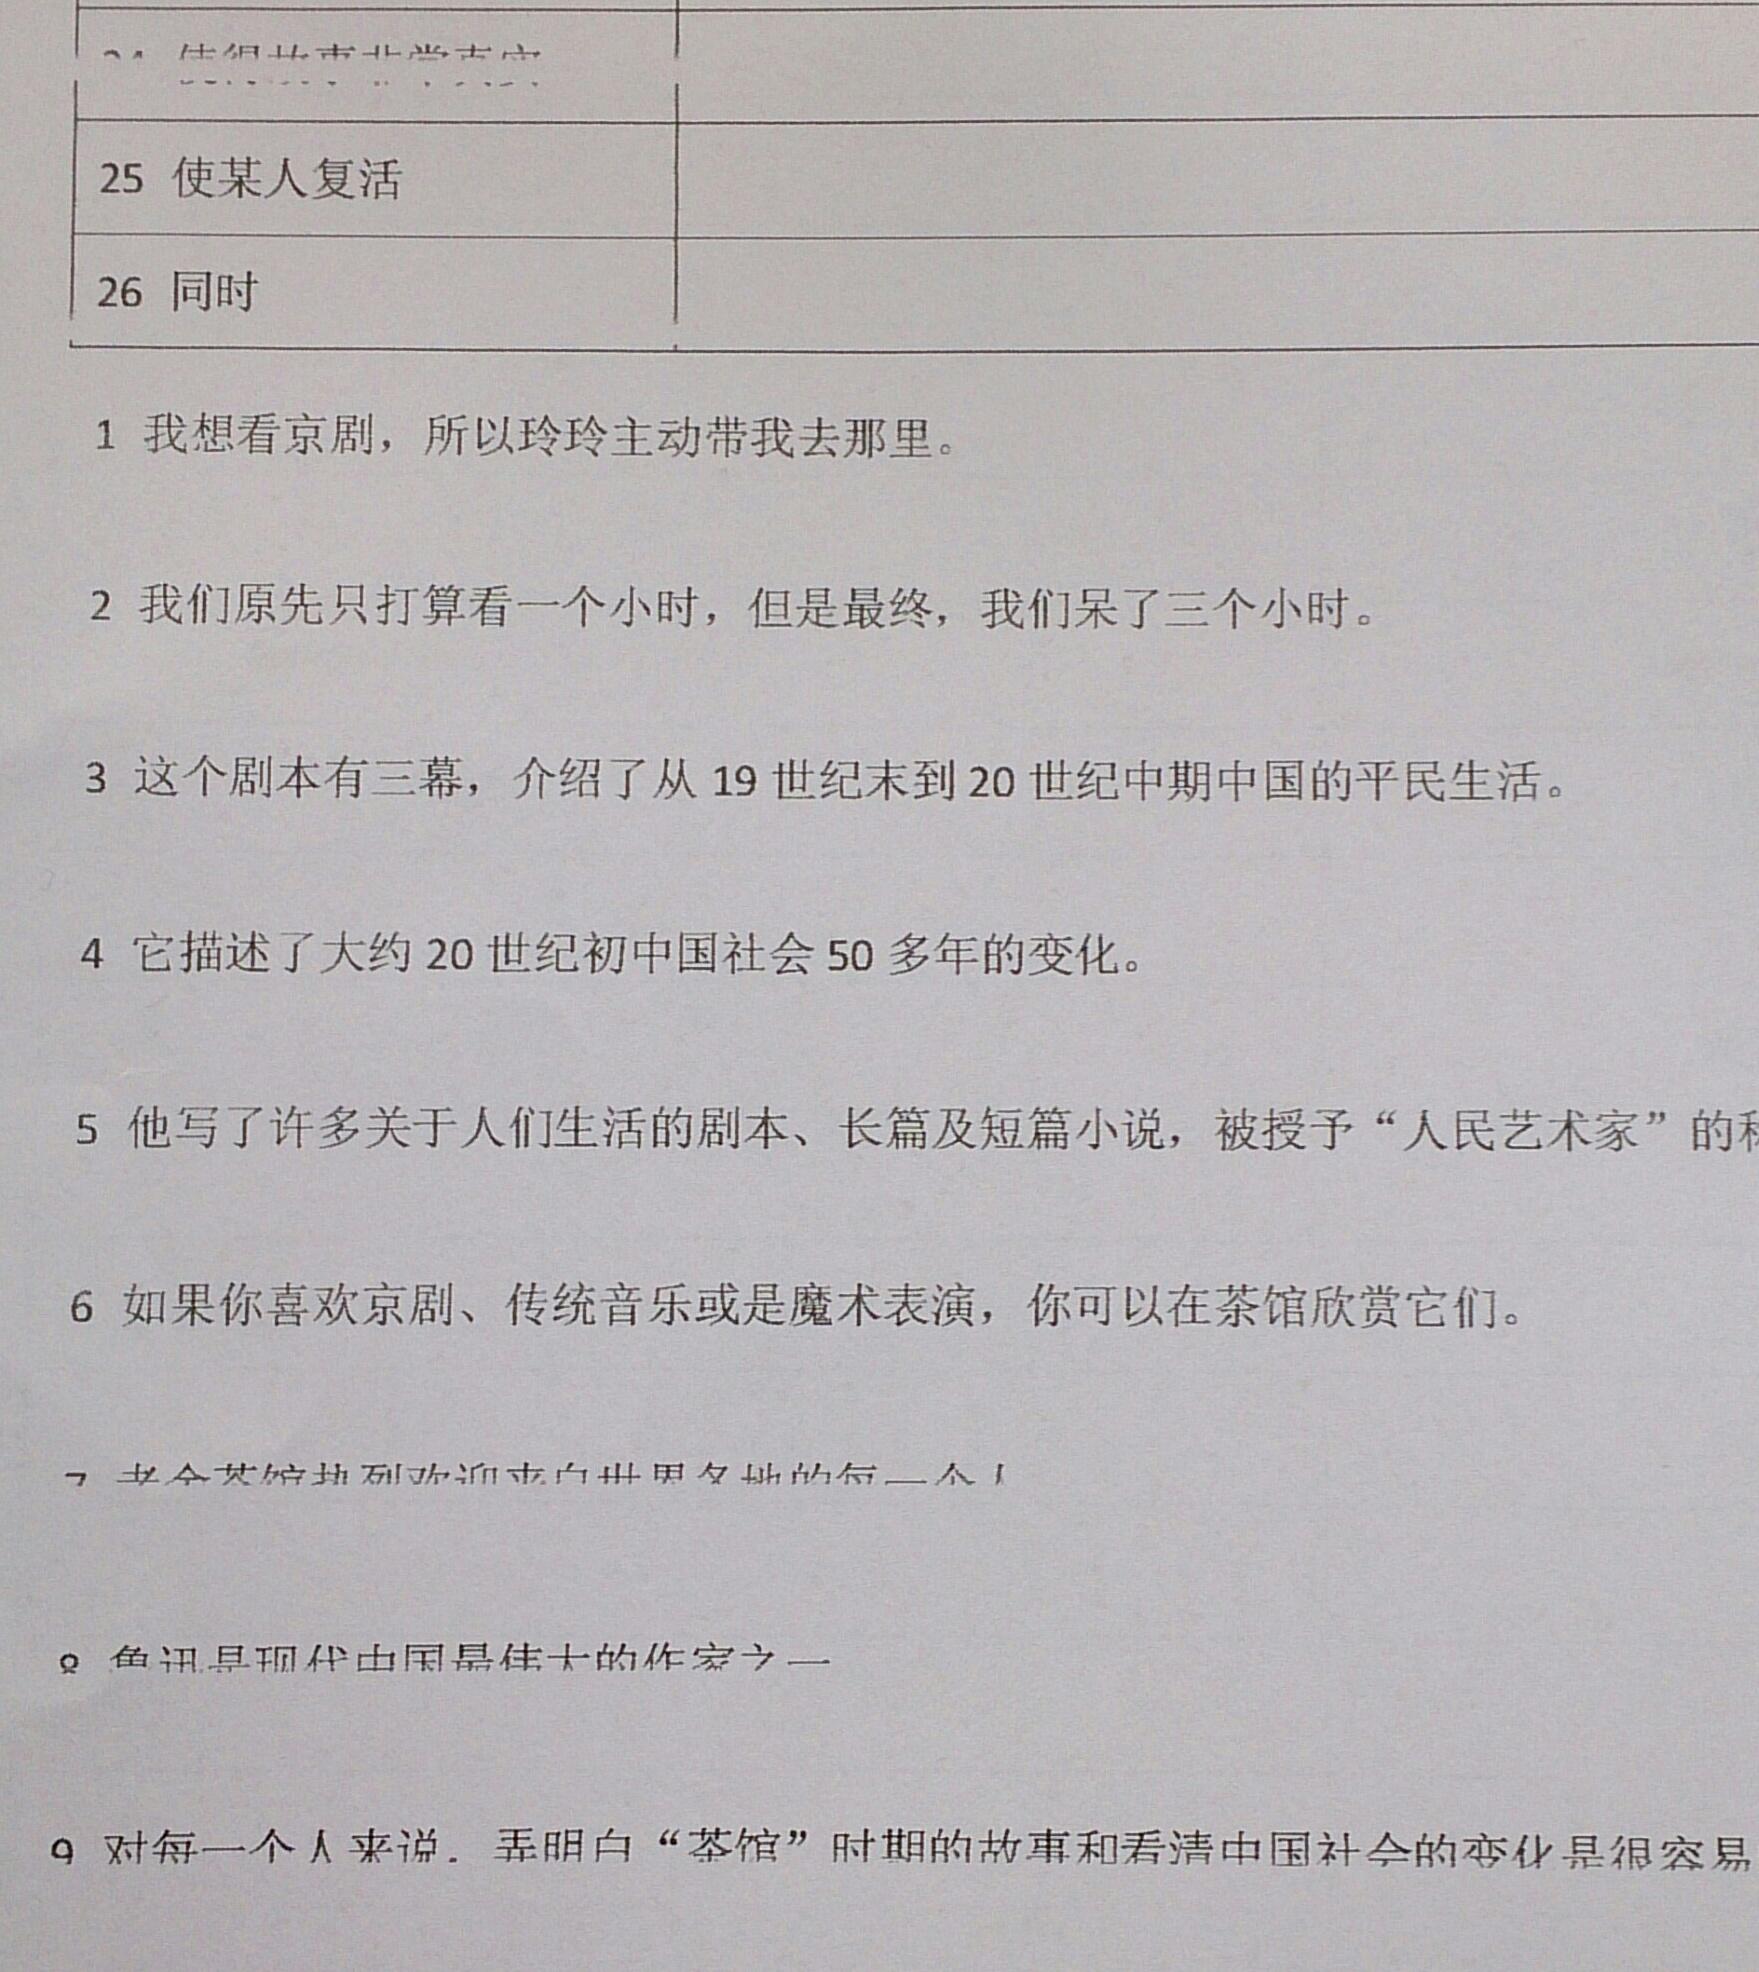 IMG_20131213_114842[1].JPG